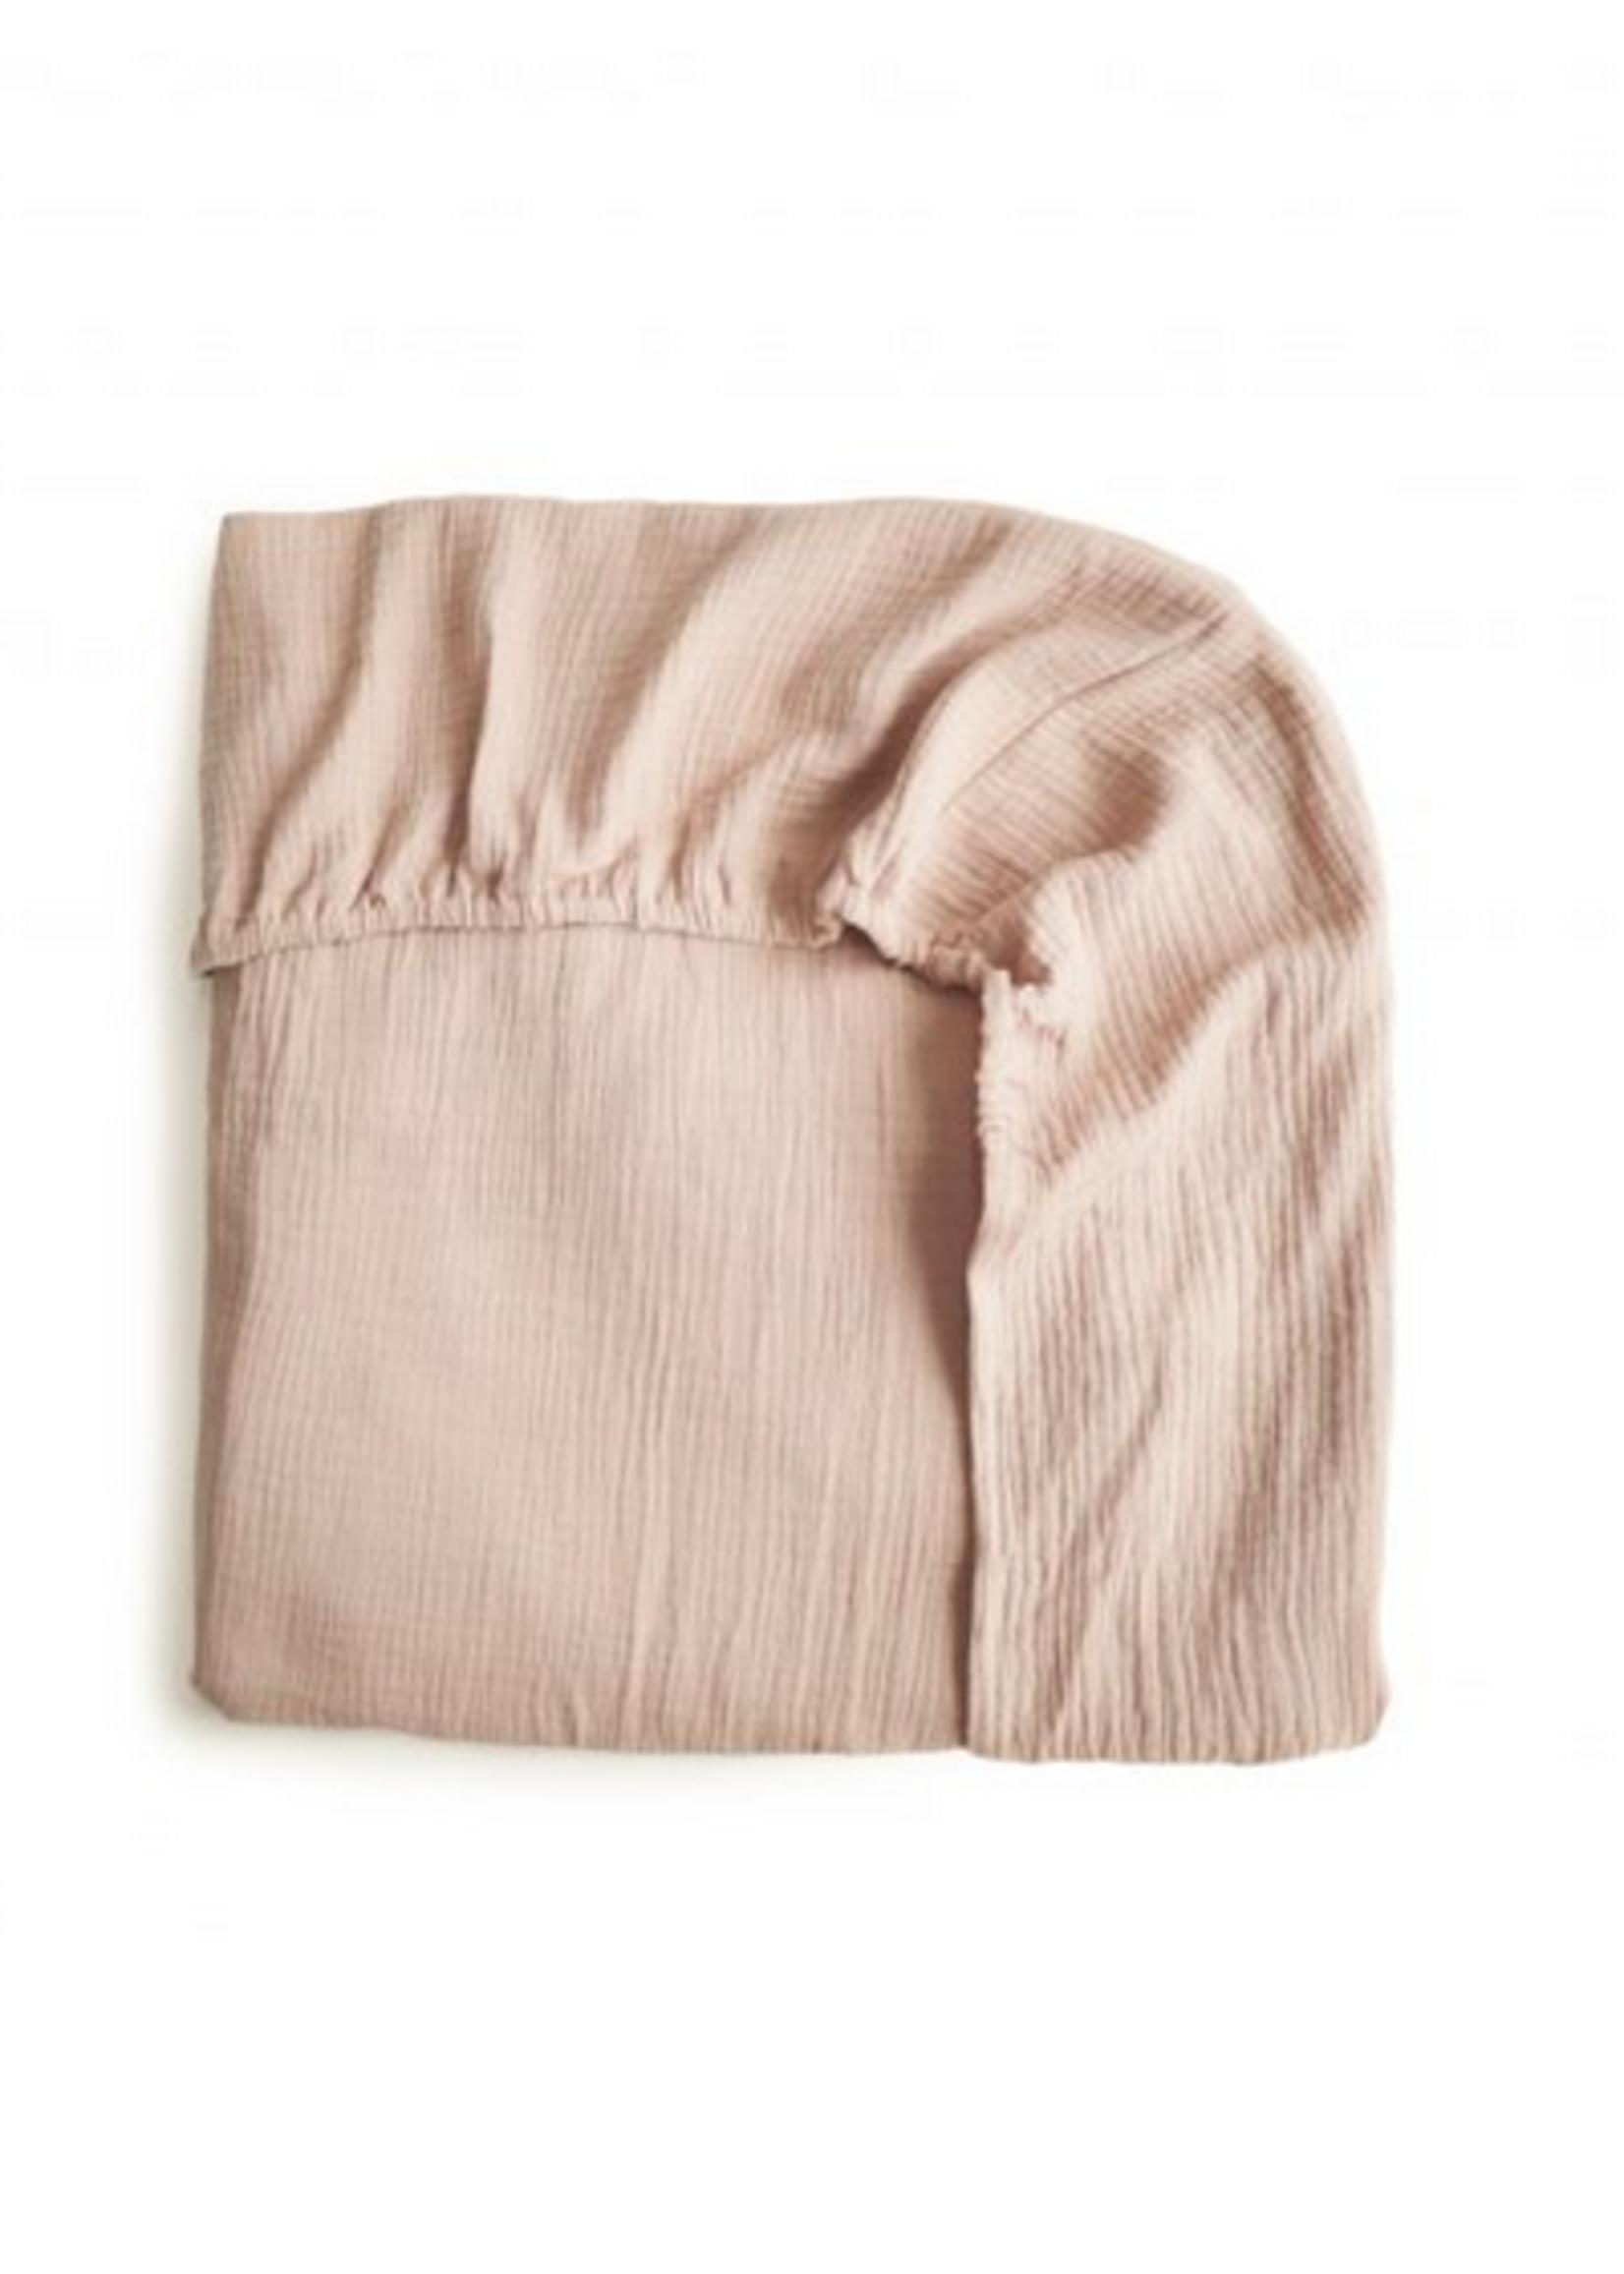 Elitaire Petite Extra Soft Muslin Crib Sheet in Blush